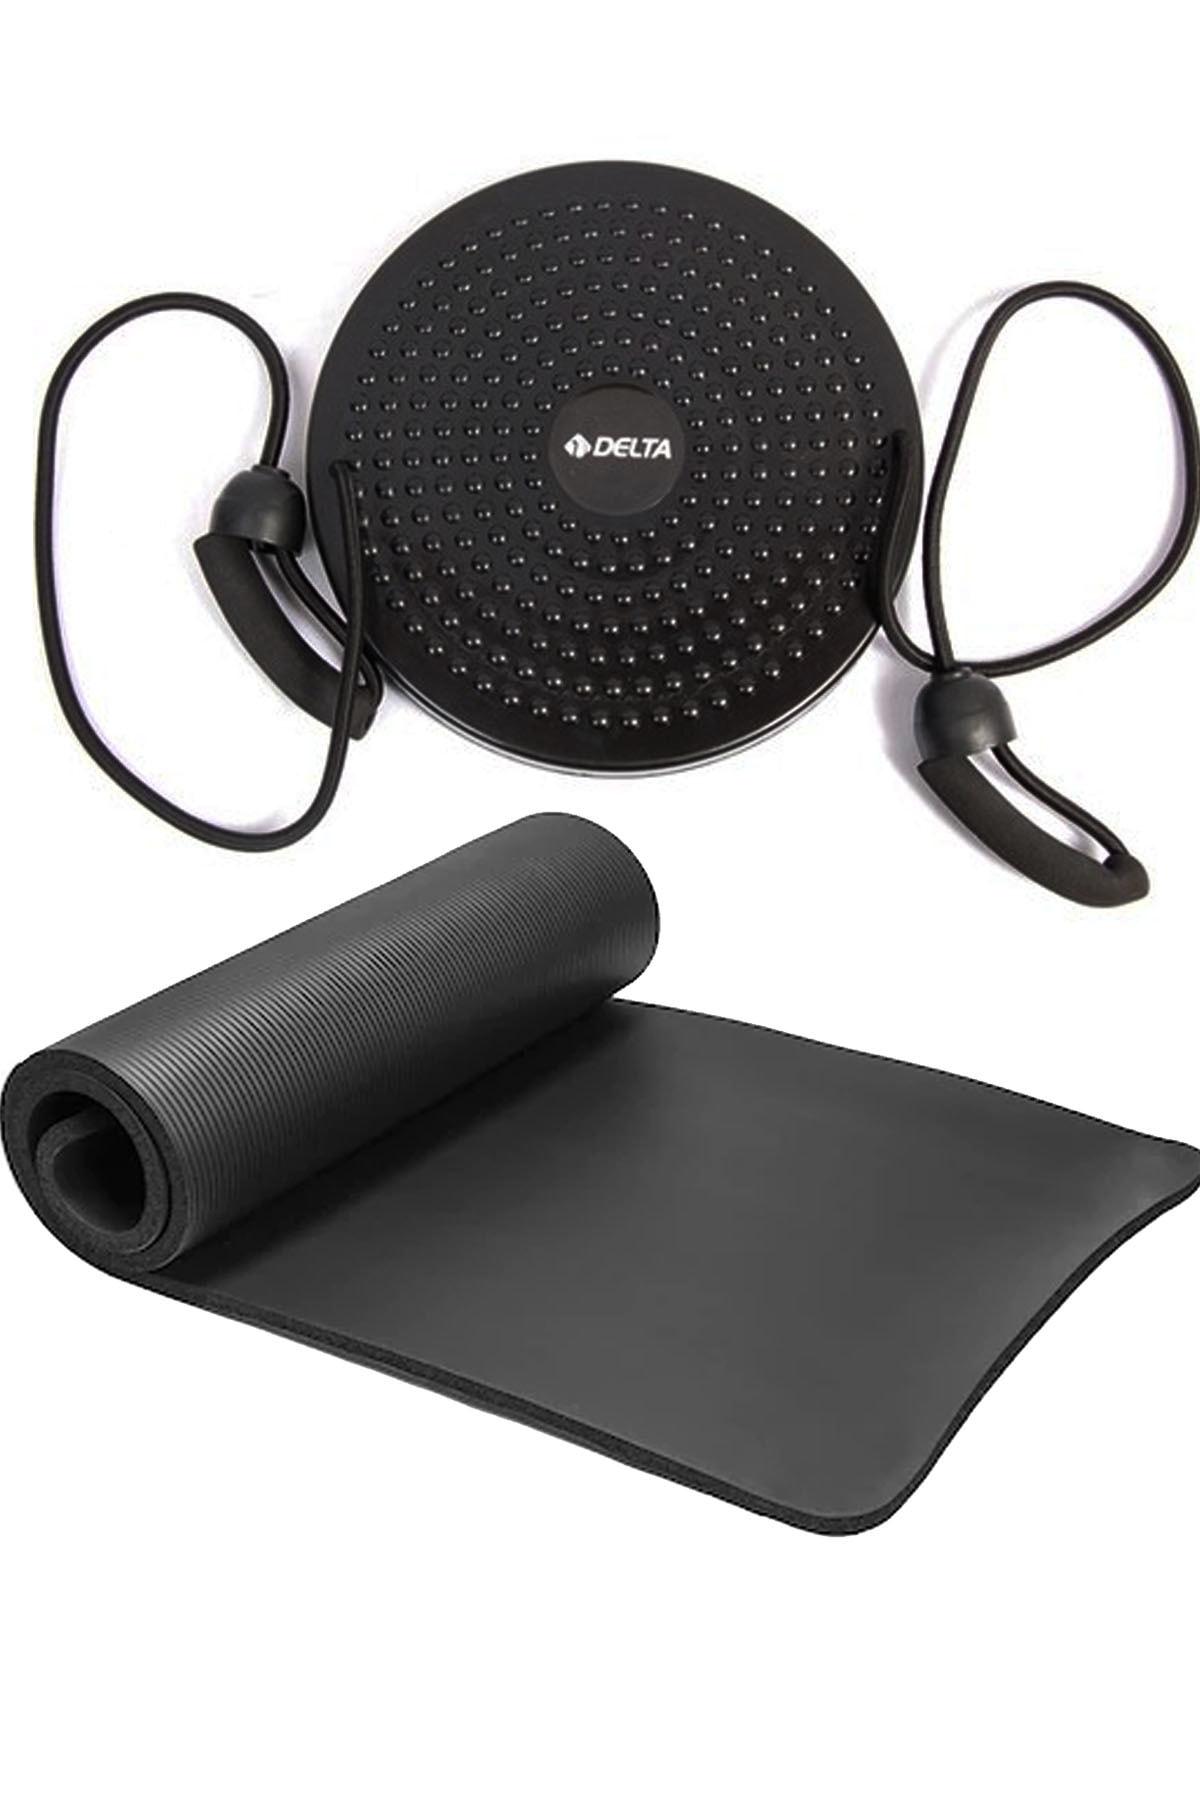 Delta 1 Cm Pilates Minderi, Çekme Direnç Lastikli Twister Disk Plates Yoga Matı Seti